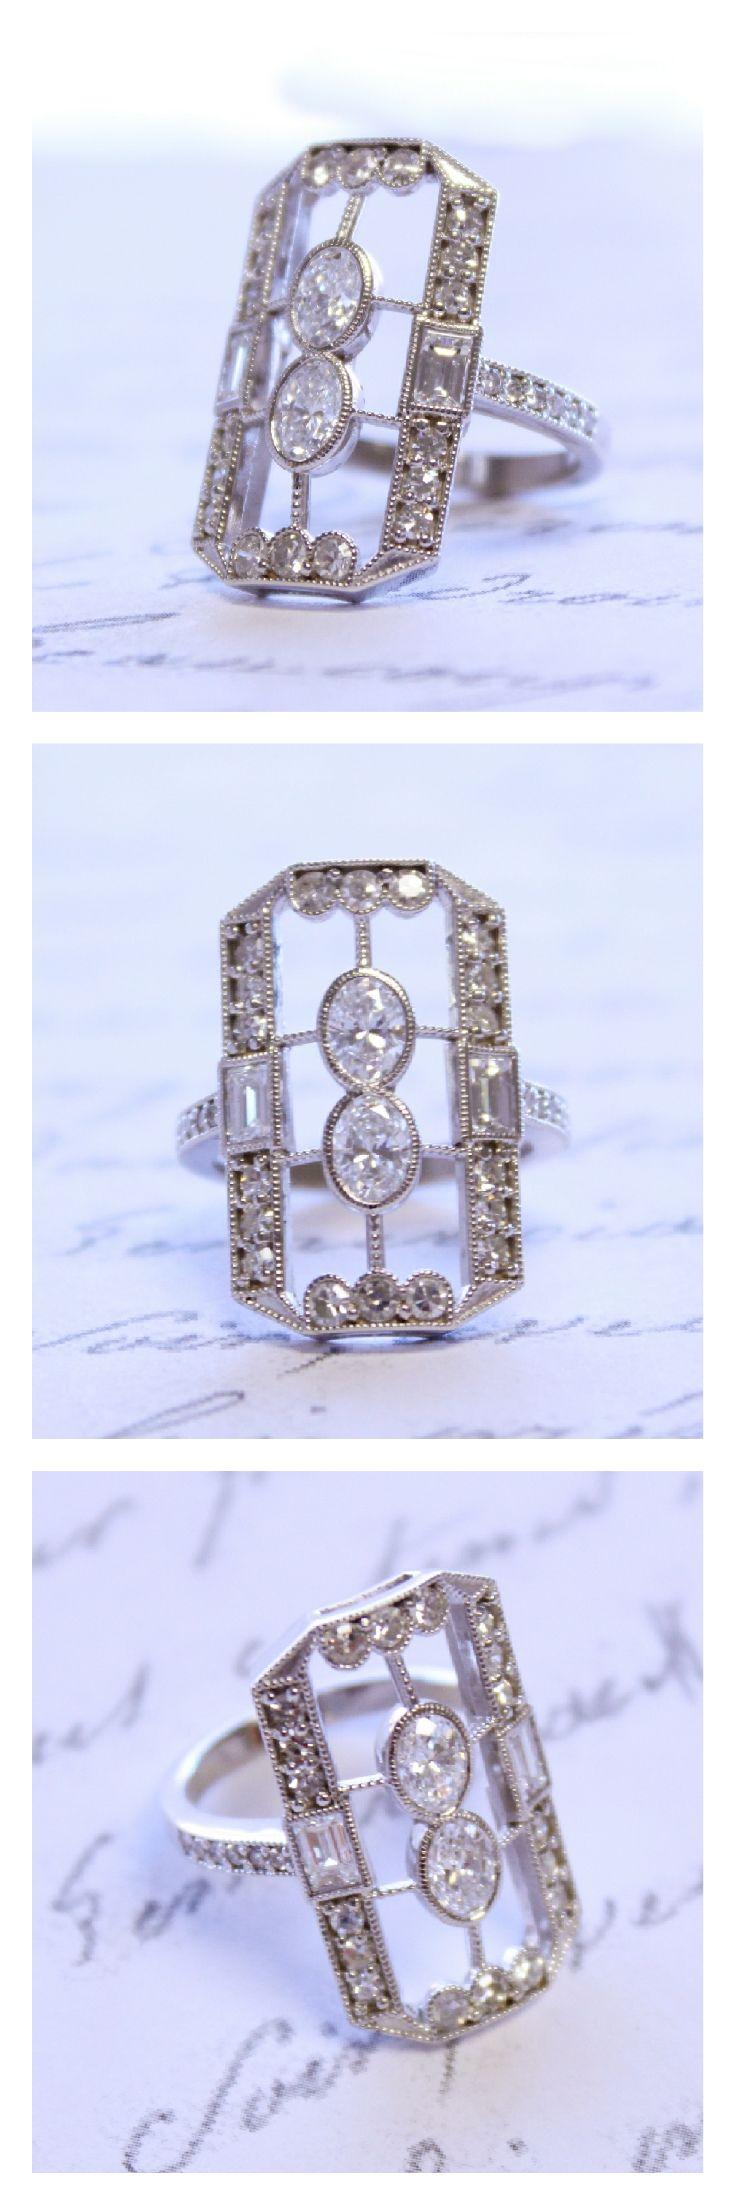 14K White Gold Diamond Vintage-Inspired Ring - 1.71 carats of diamonds in an Art Deco inspired Custom setting